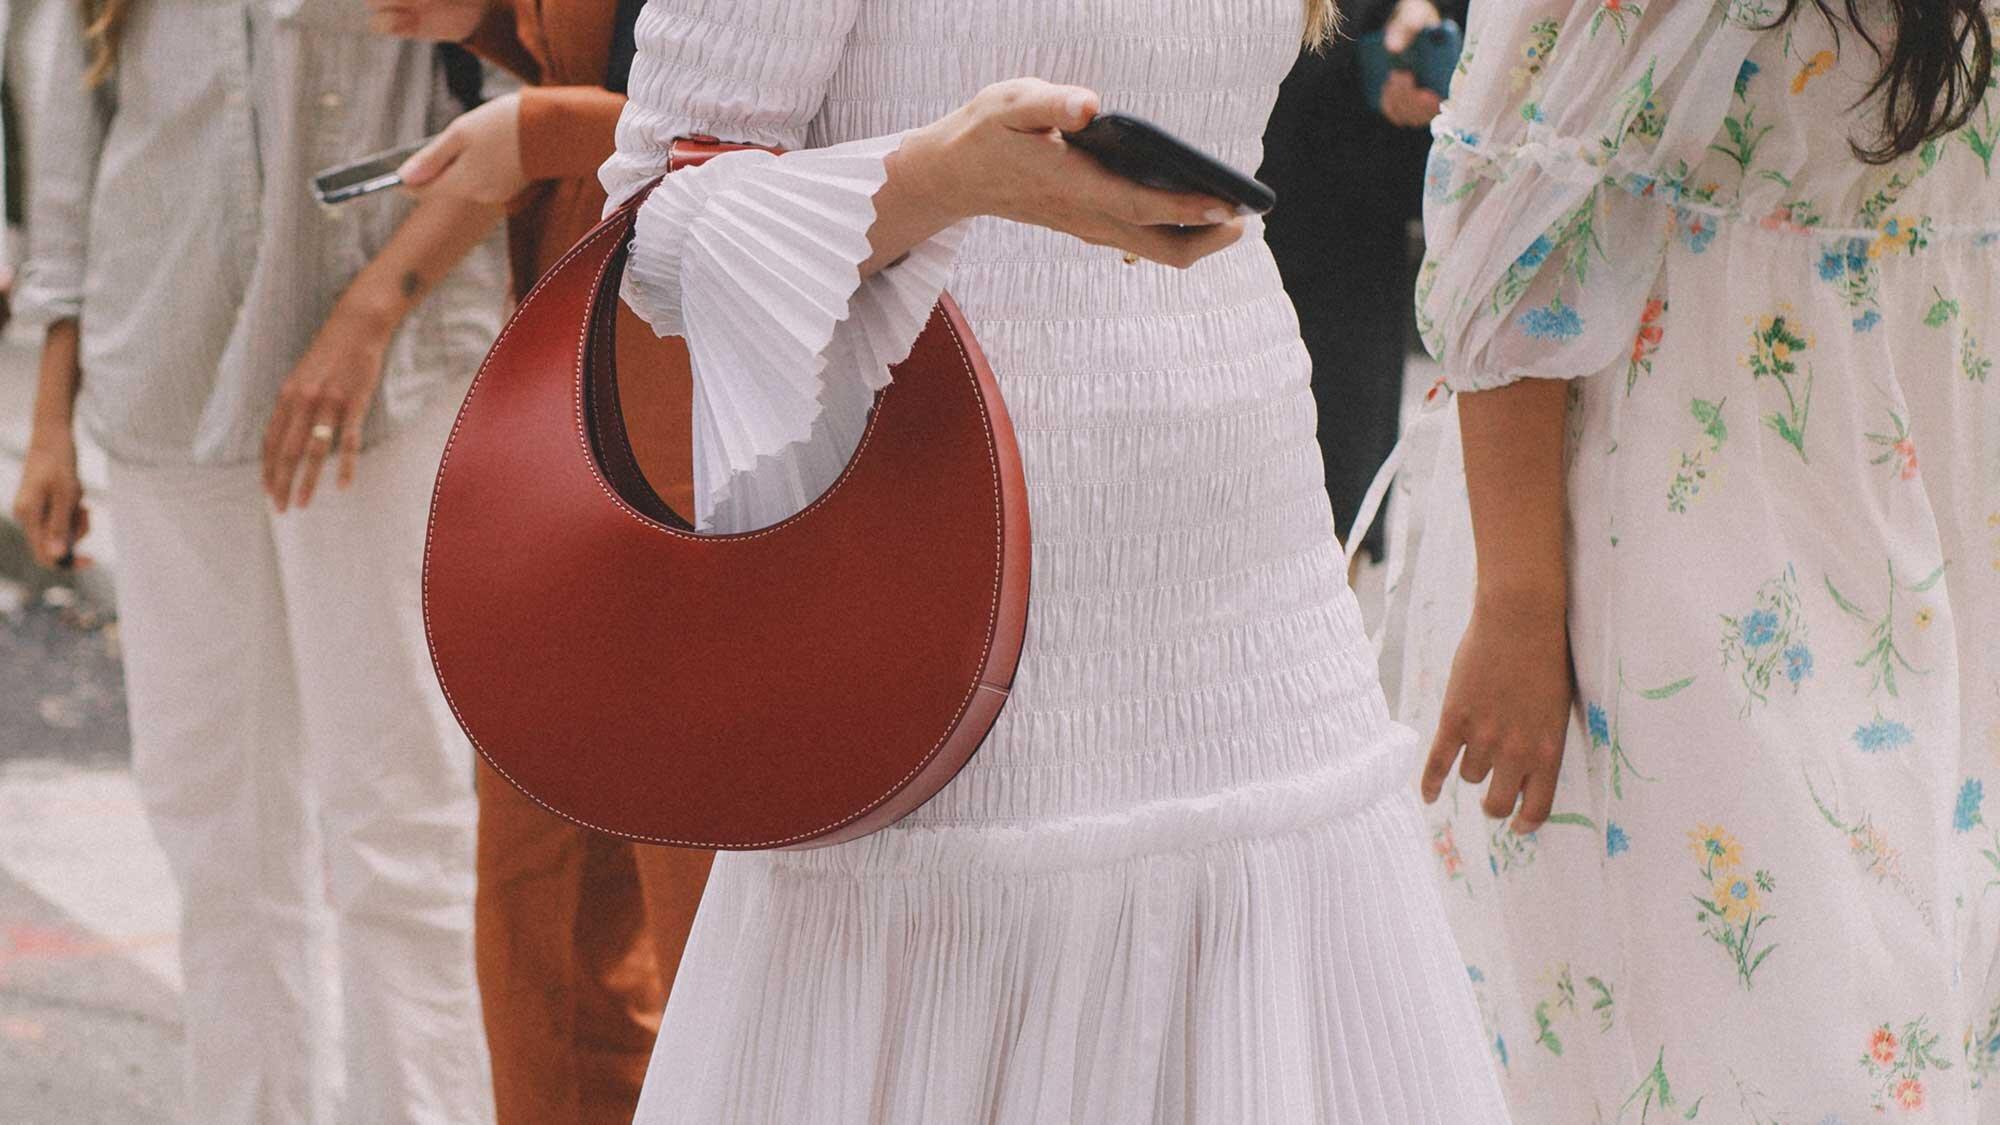 13 Best Handbags of NYFW Street Style - Best Handbags of NYFW Street Style // Photos shot by Jose Martinez (@J2Martinez)